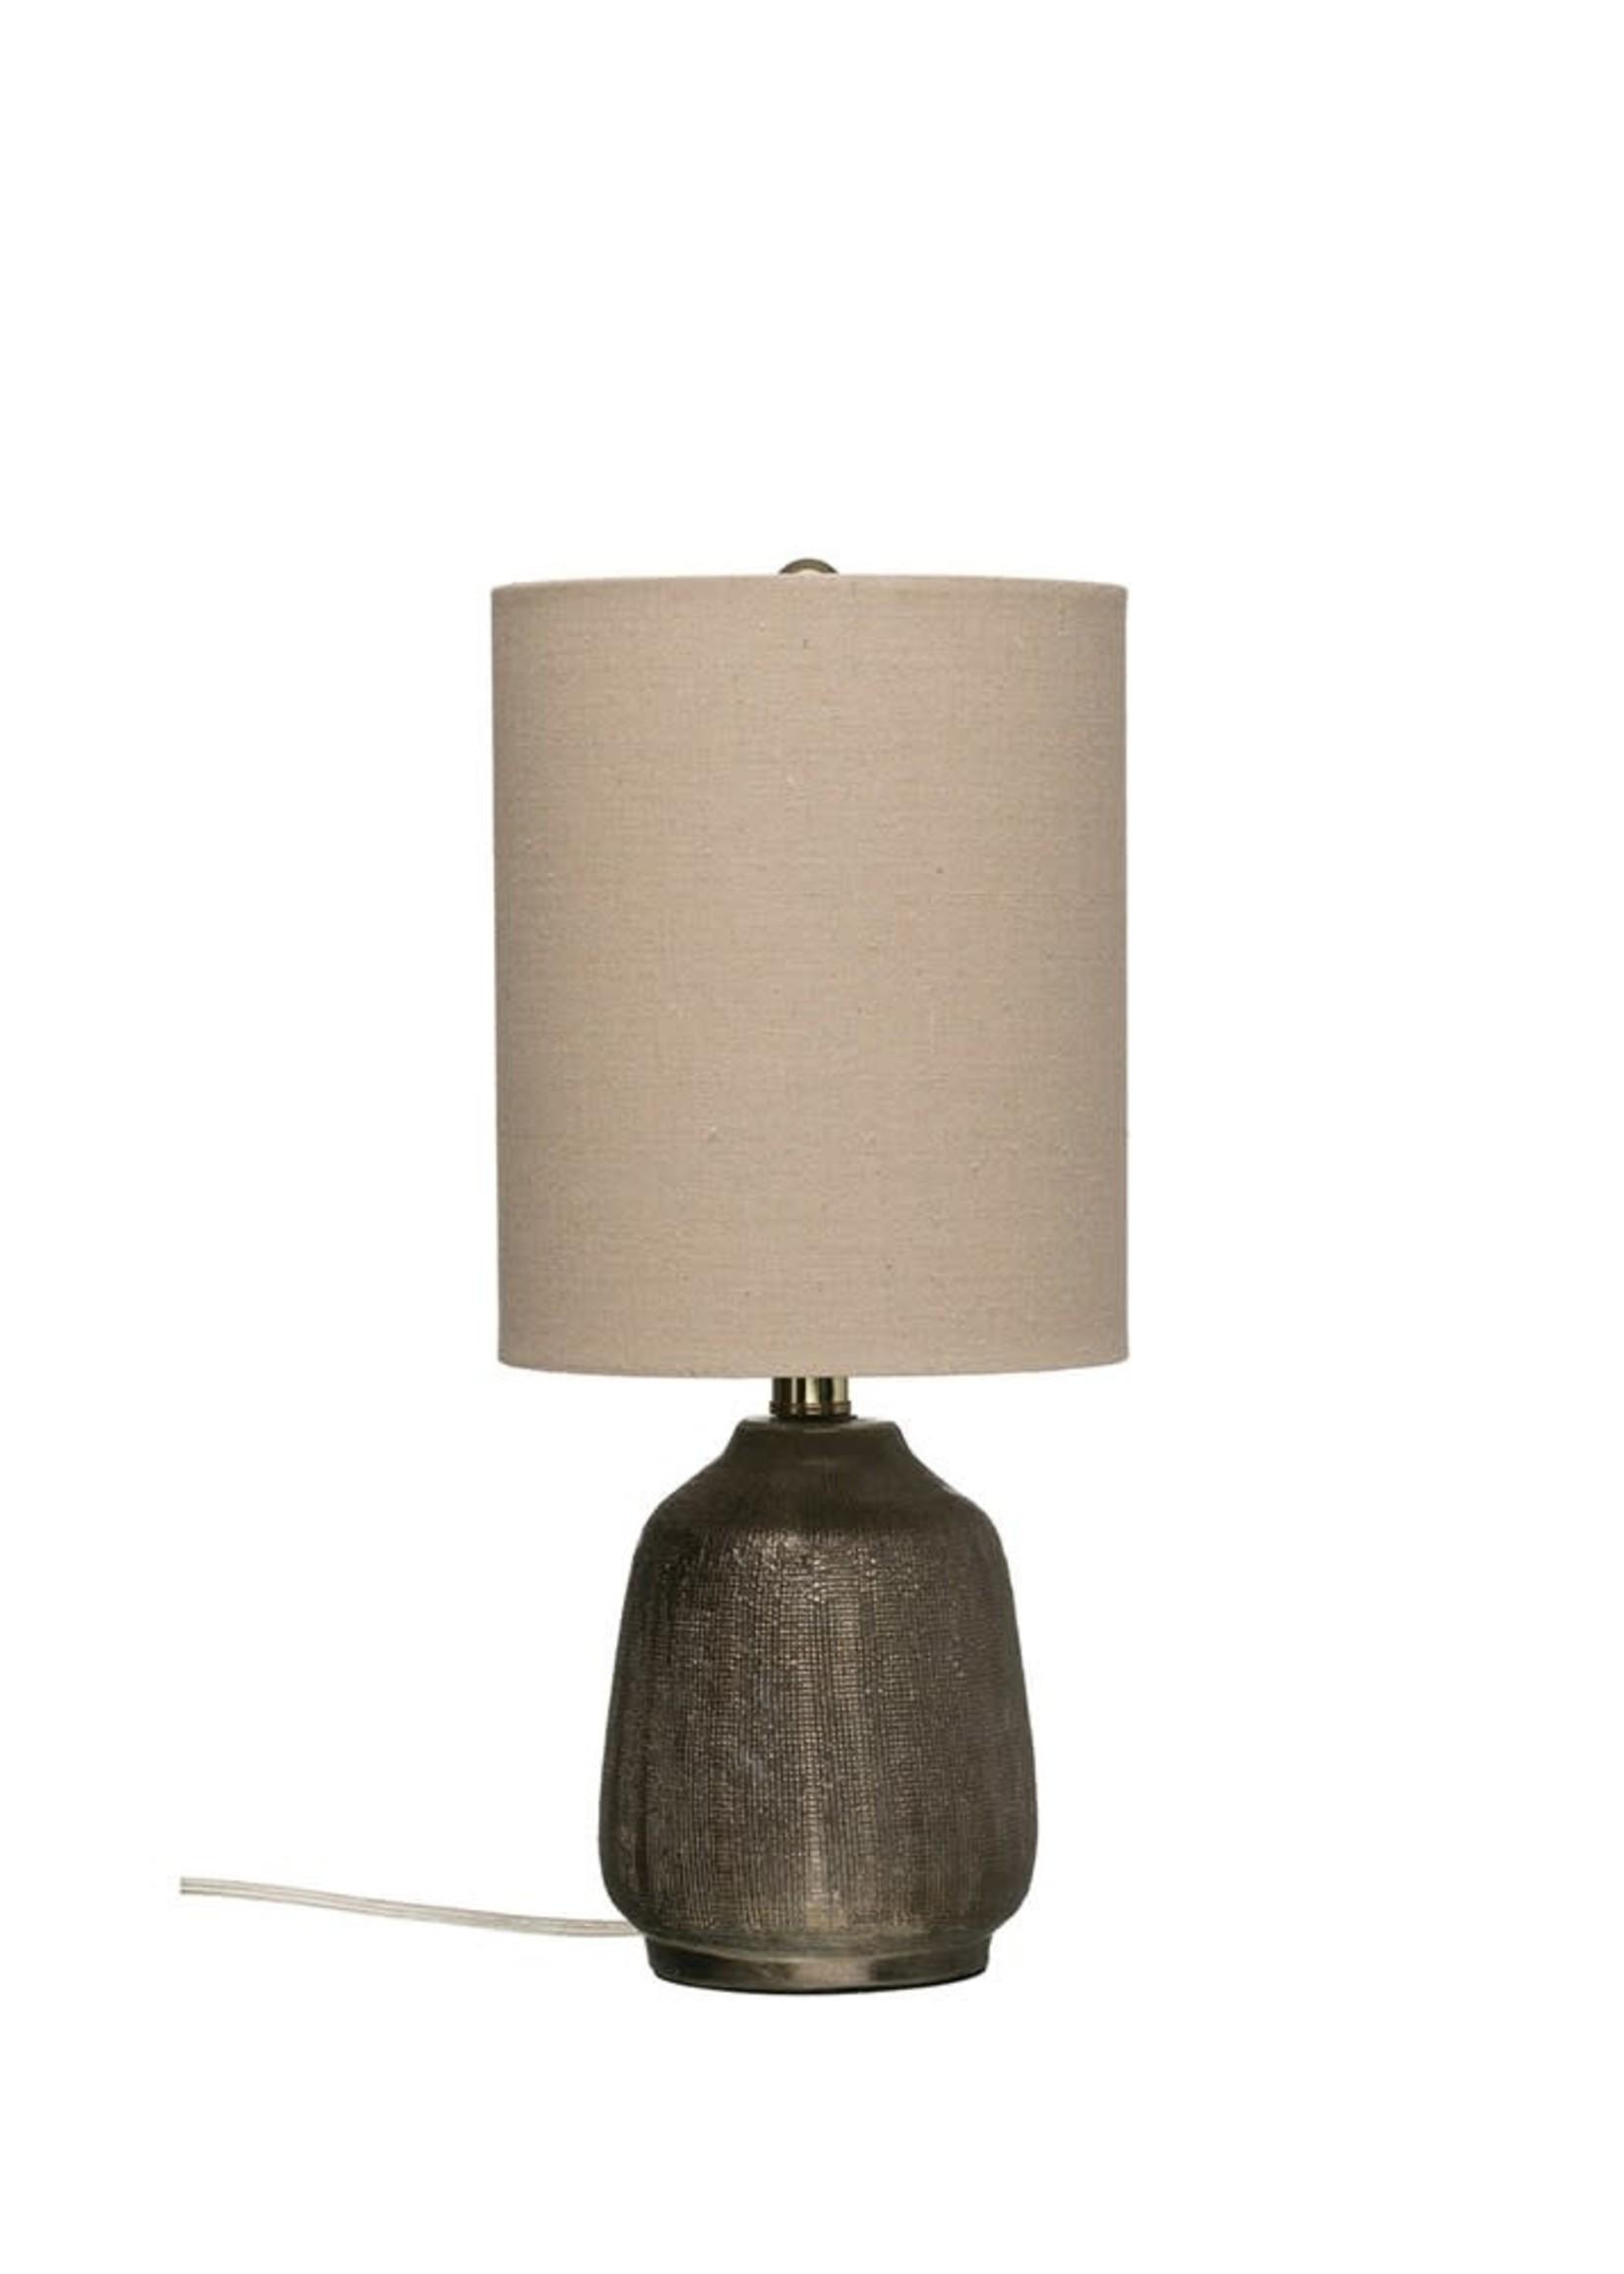 "Creative Co-Op 8"" x 18"" Terra-Cotta Lamp w/ Linen Shade, Metallic Glaze"